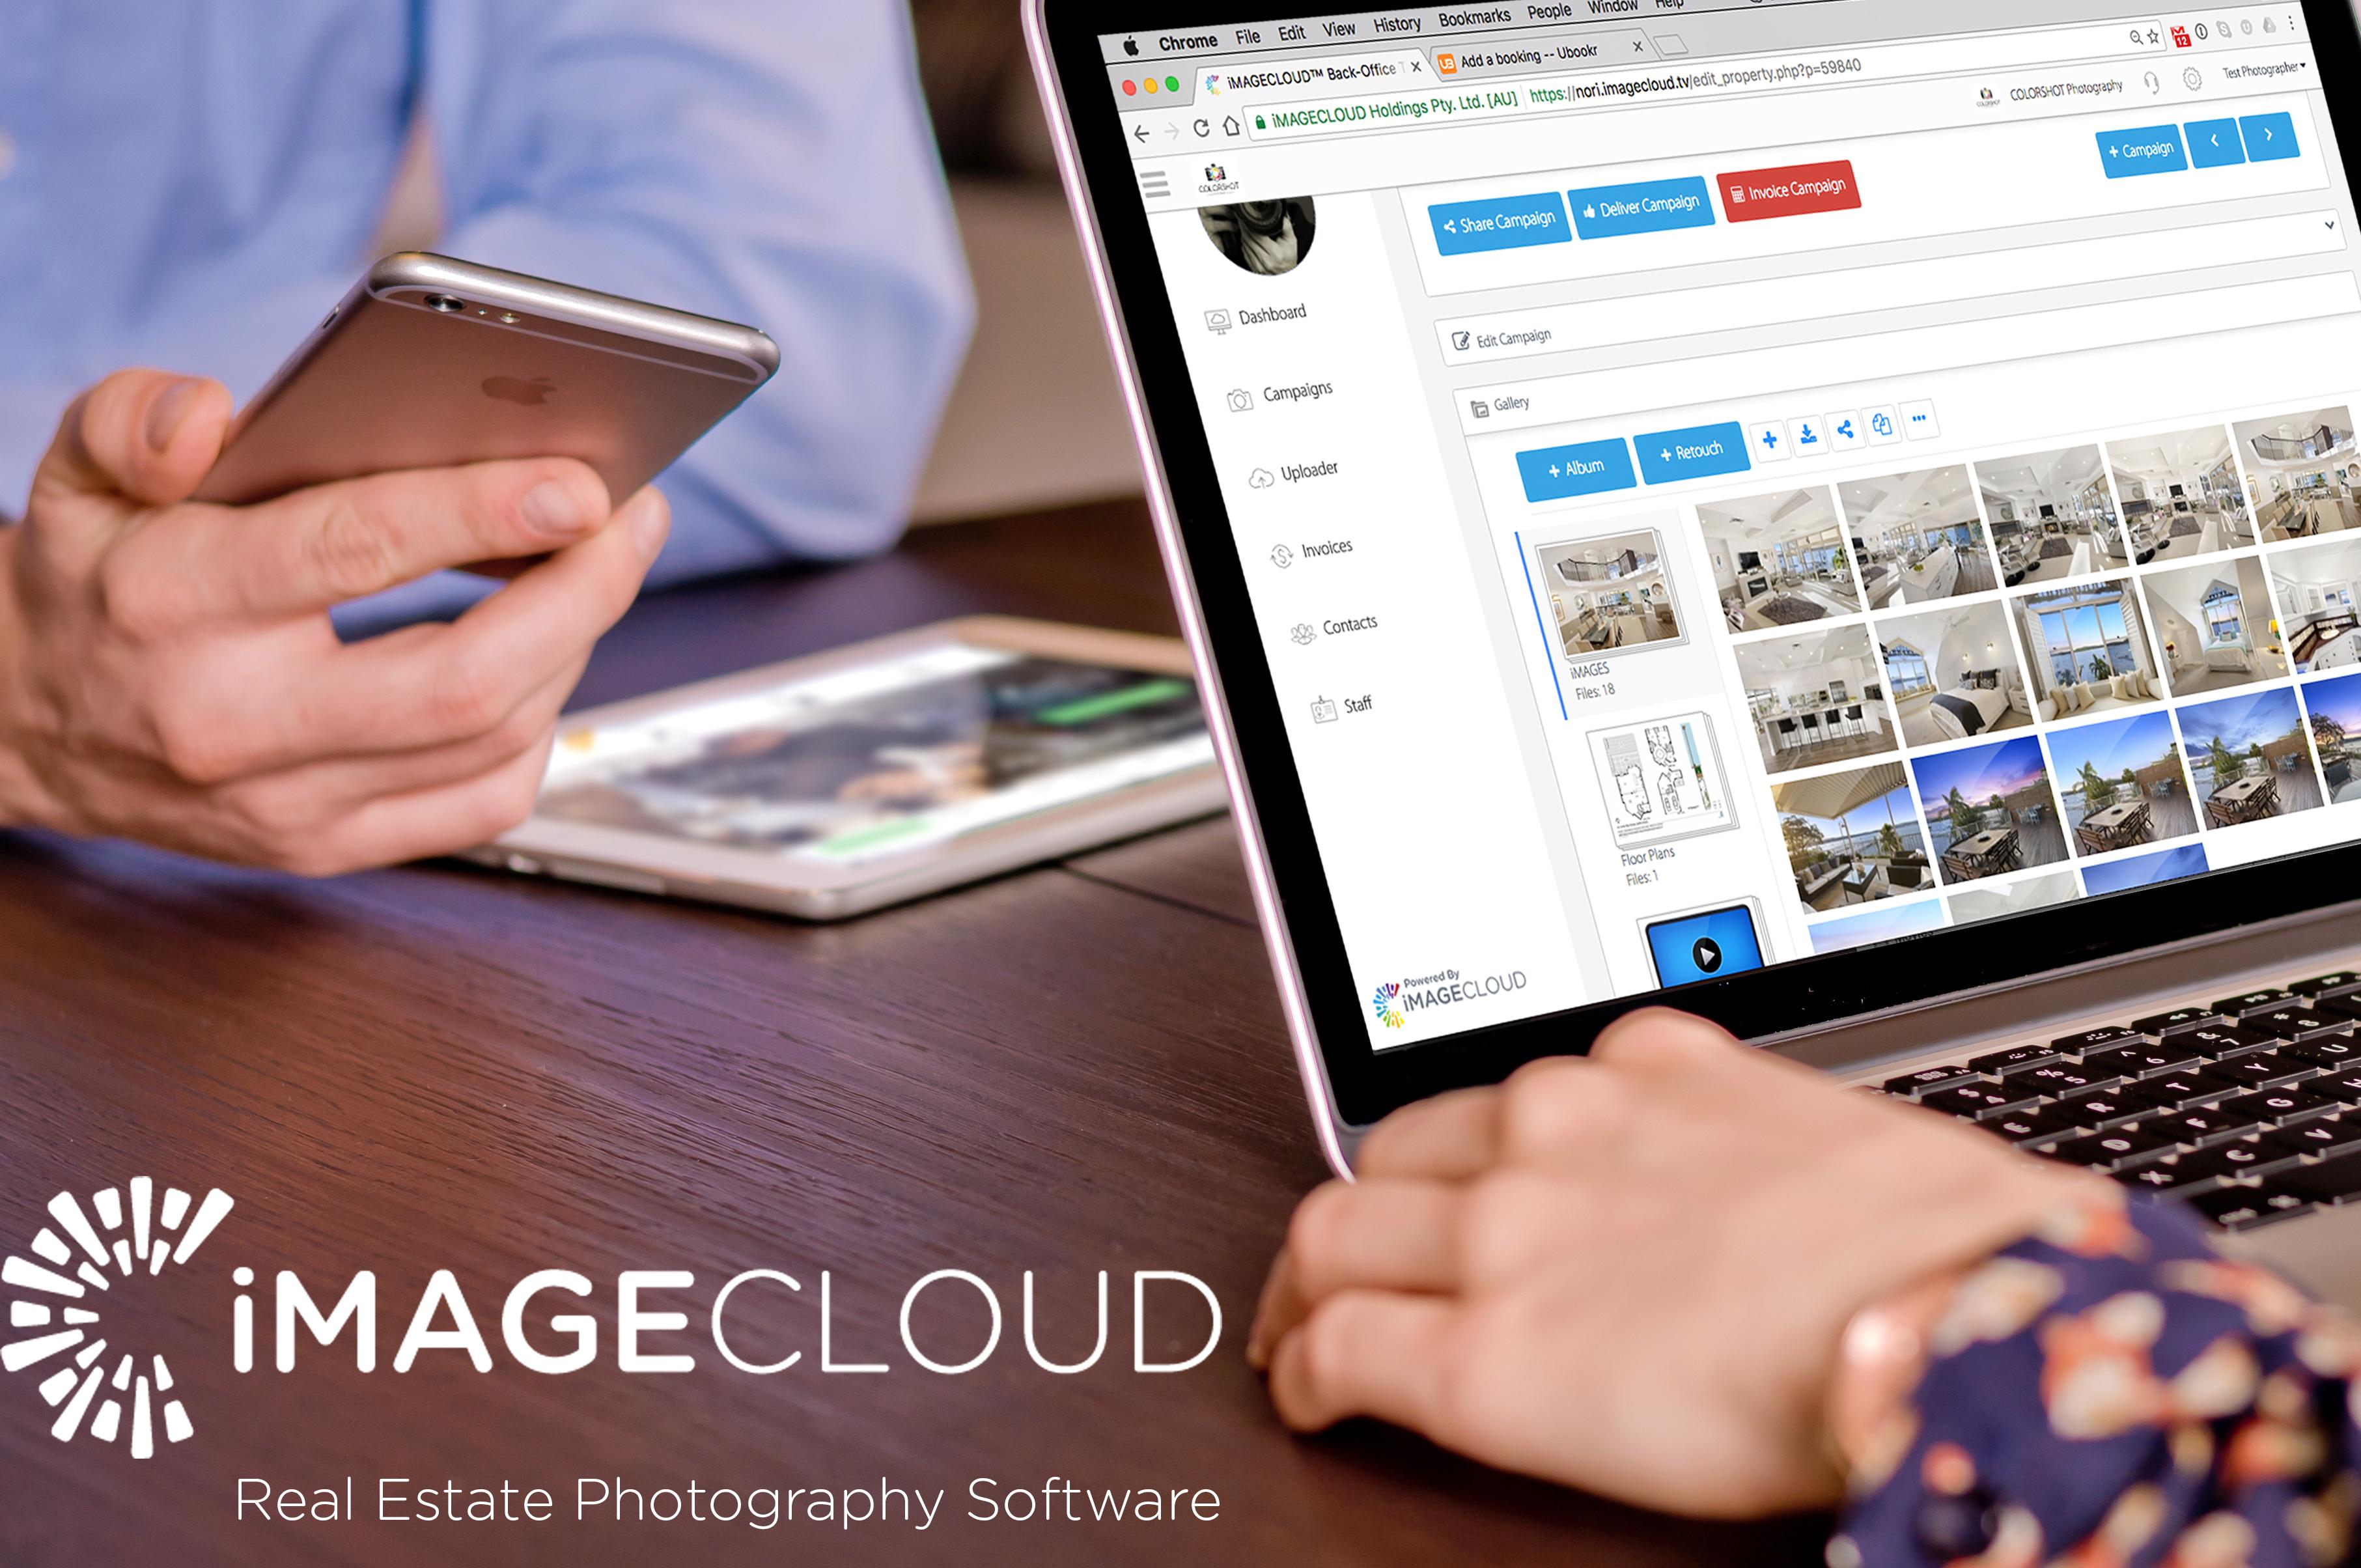 imagecloud_image02